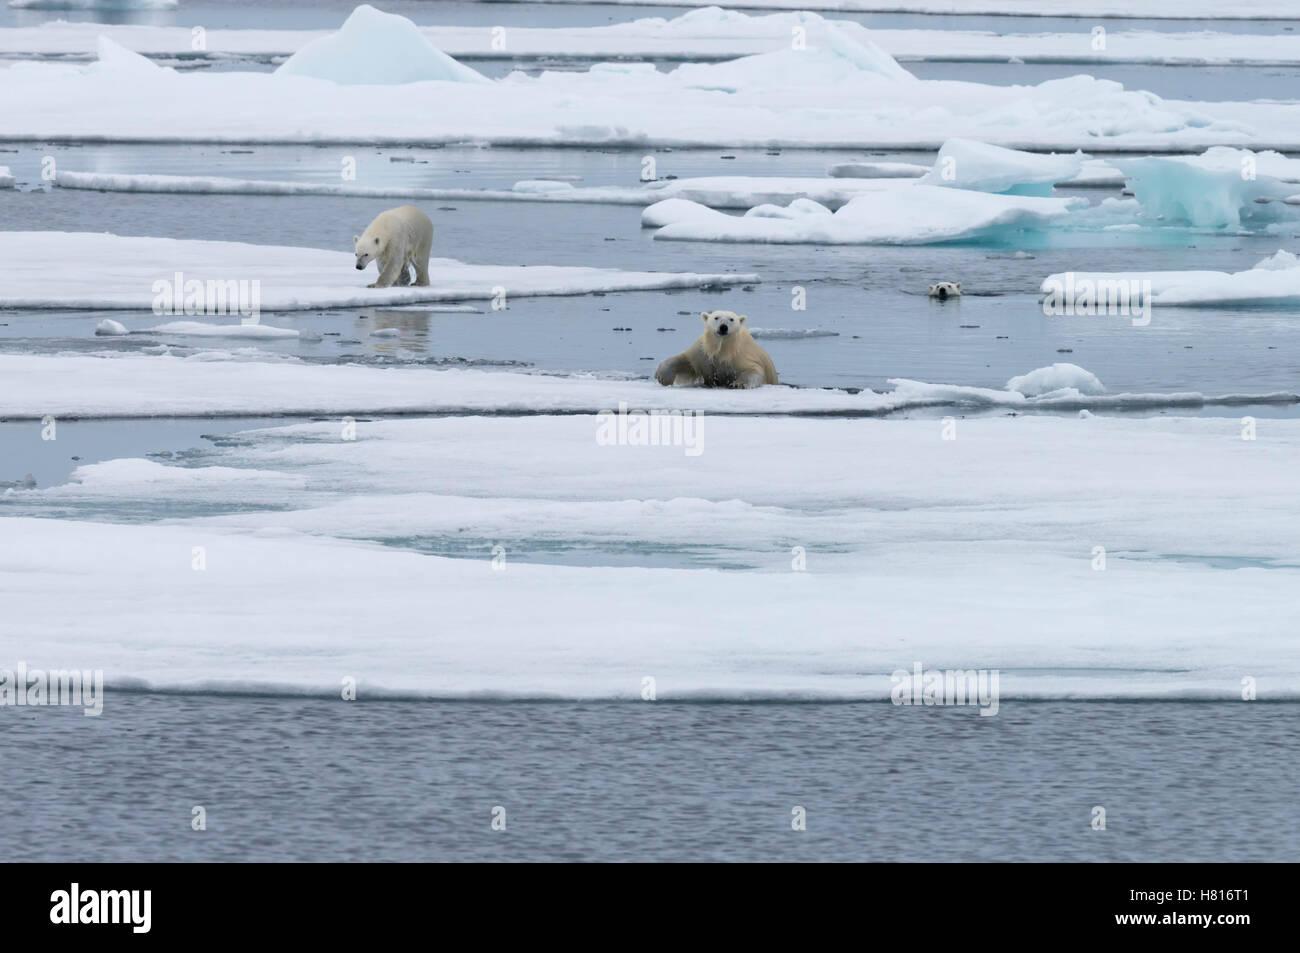 Madre de oso polar (Ursus maritimus) con dos cachorros, caminar y nadar a través de la fusión de témpanos, Imagen De Stock